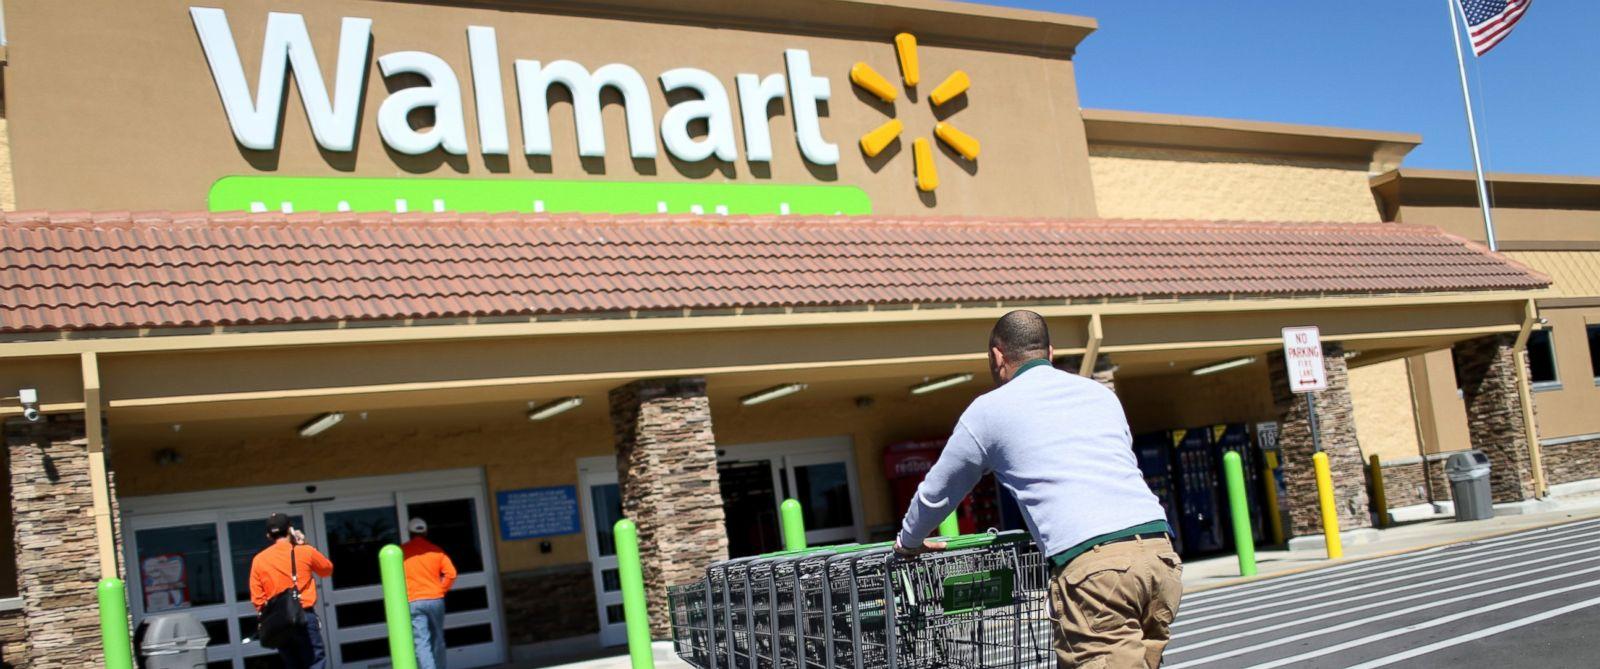 PHOTO: Walmart employee Yurdin Velazquez pushes grocery carts at a Walmart store, Feb. 19, 2015, in Miami, Florida.